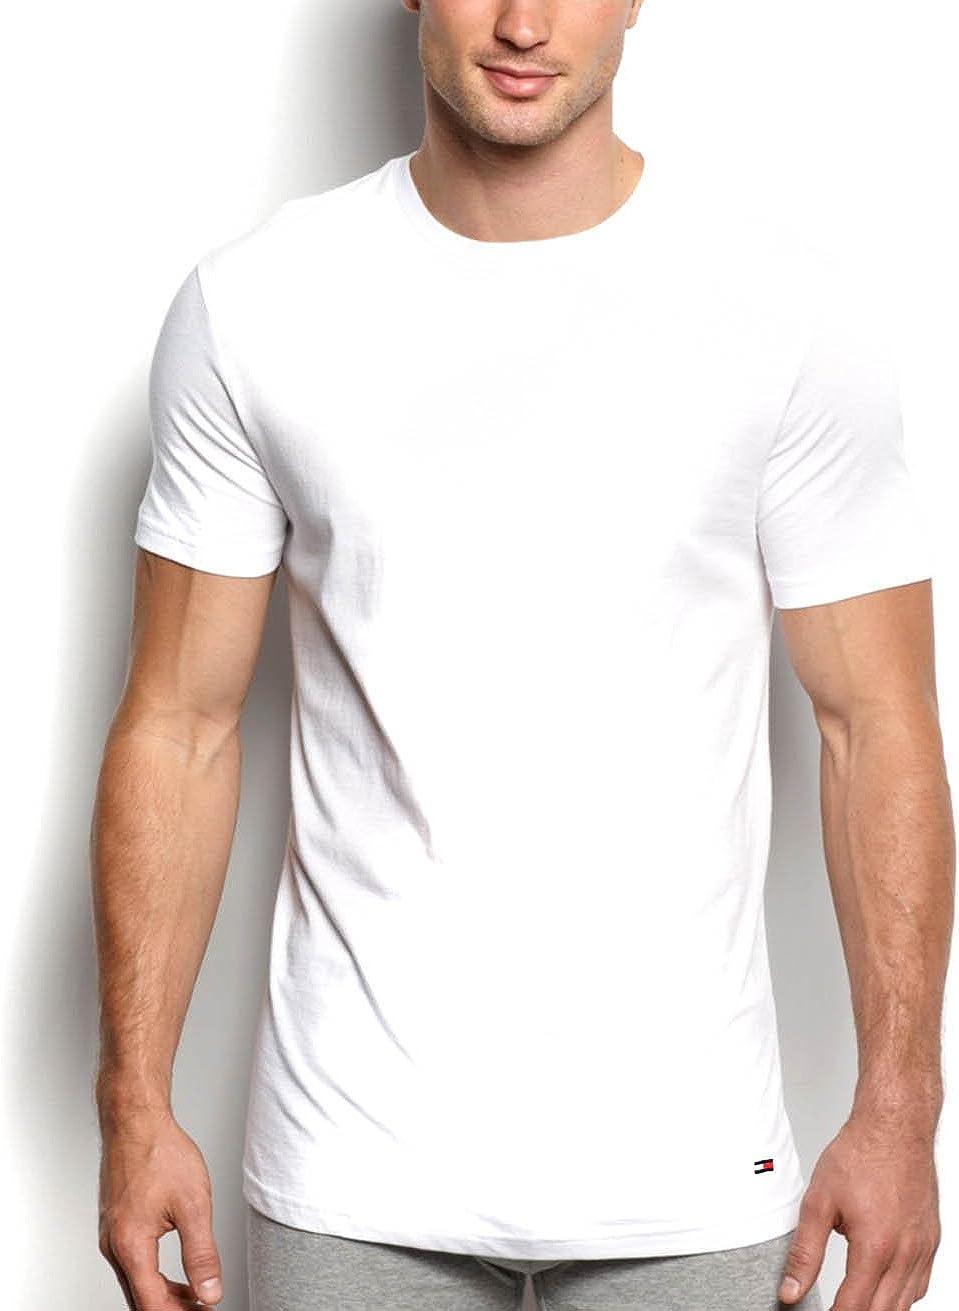 Tommy Hilfiger Men's Undershirts Cotton Classics Crew Neck T-Shirts